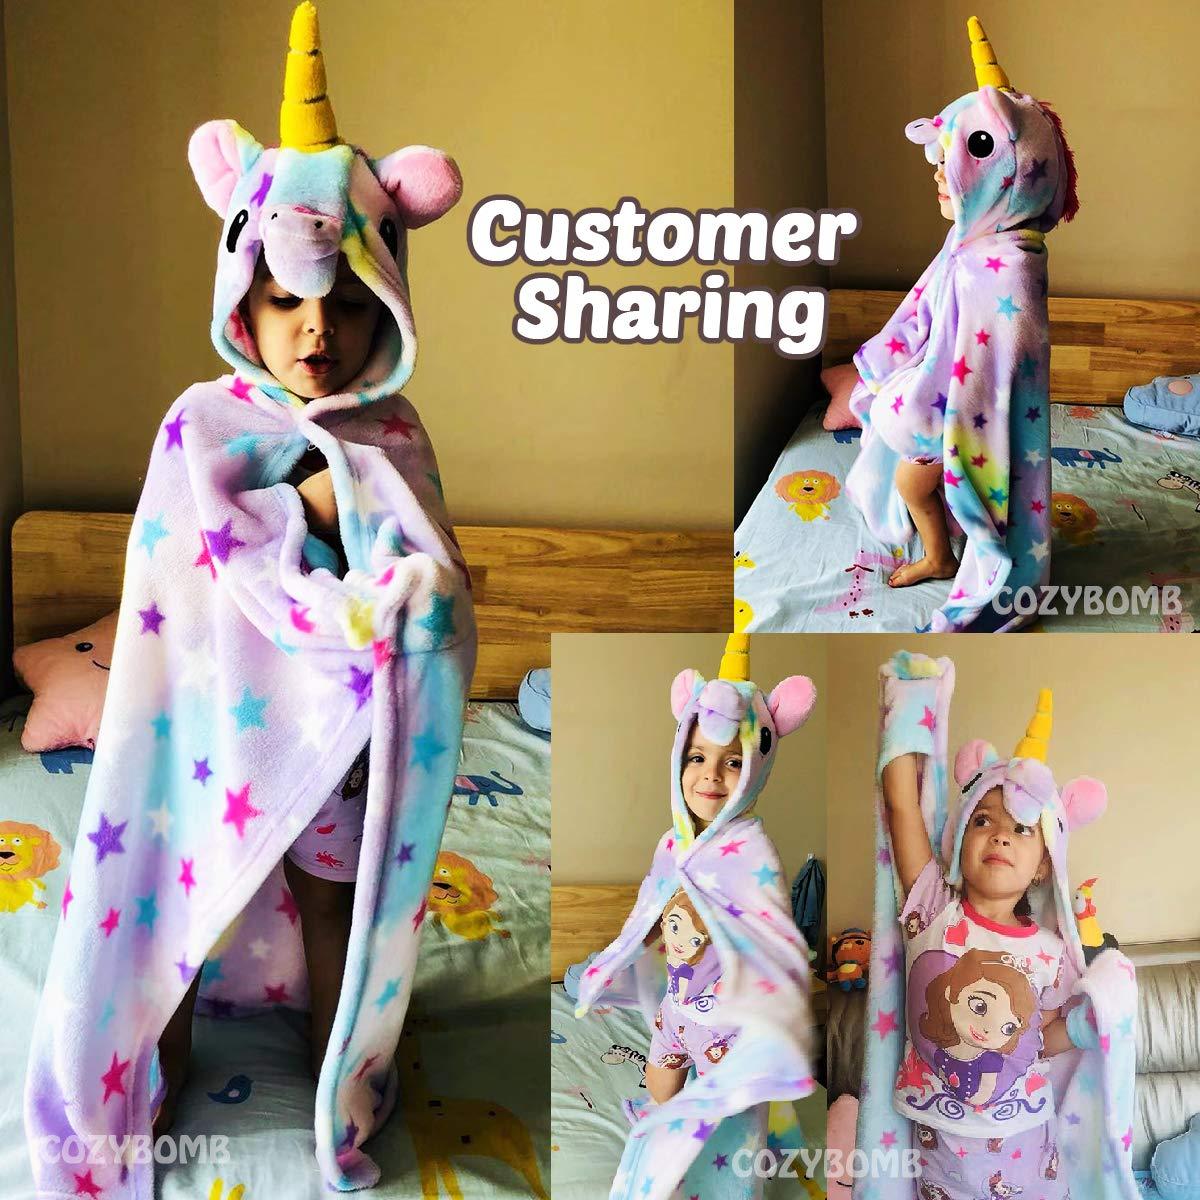 CozyBomB Rainbow Unicorn Blanket for Girls - Wearable Fleece Soft Throw Blanket for Kids Girl - Cute Hooded Plush Bathrobe Cozy Wrap with Hood Sleep Pretend Play age 3 4 5 6 Year Old Christmas Costume by CozyBomB